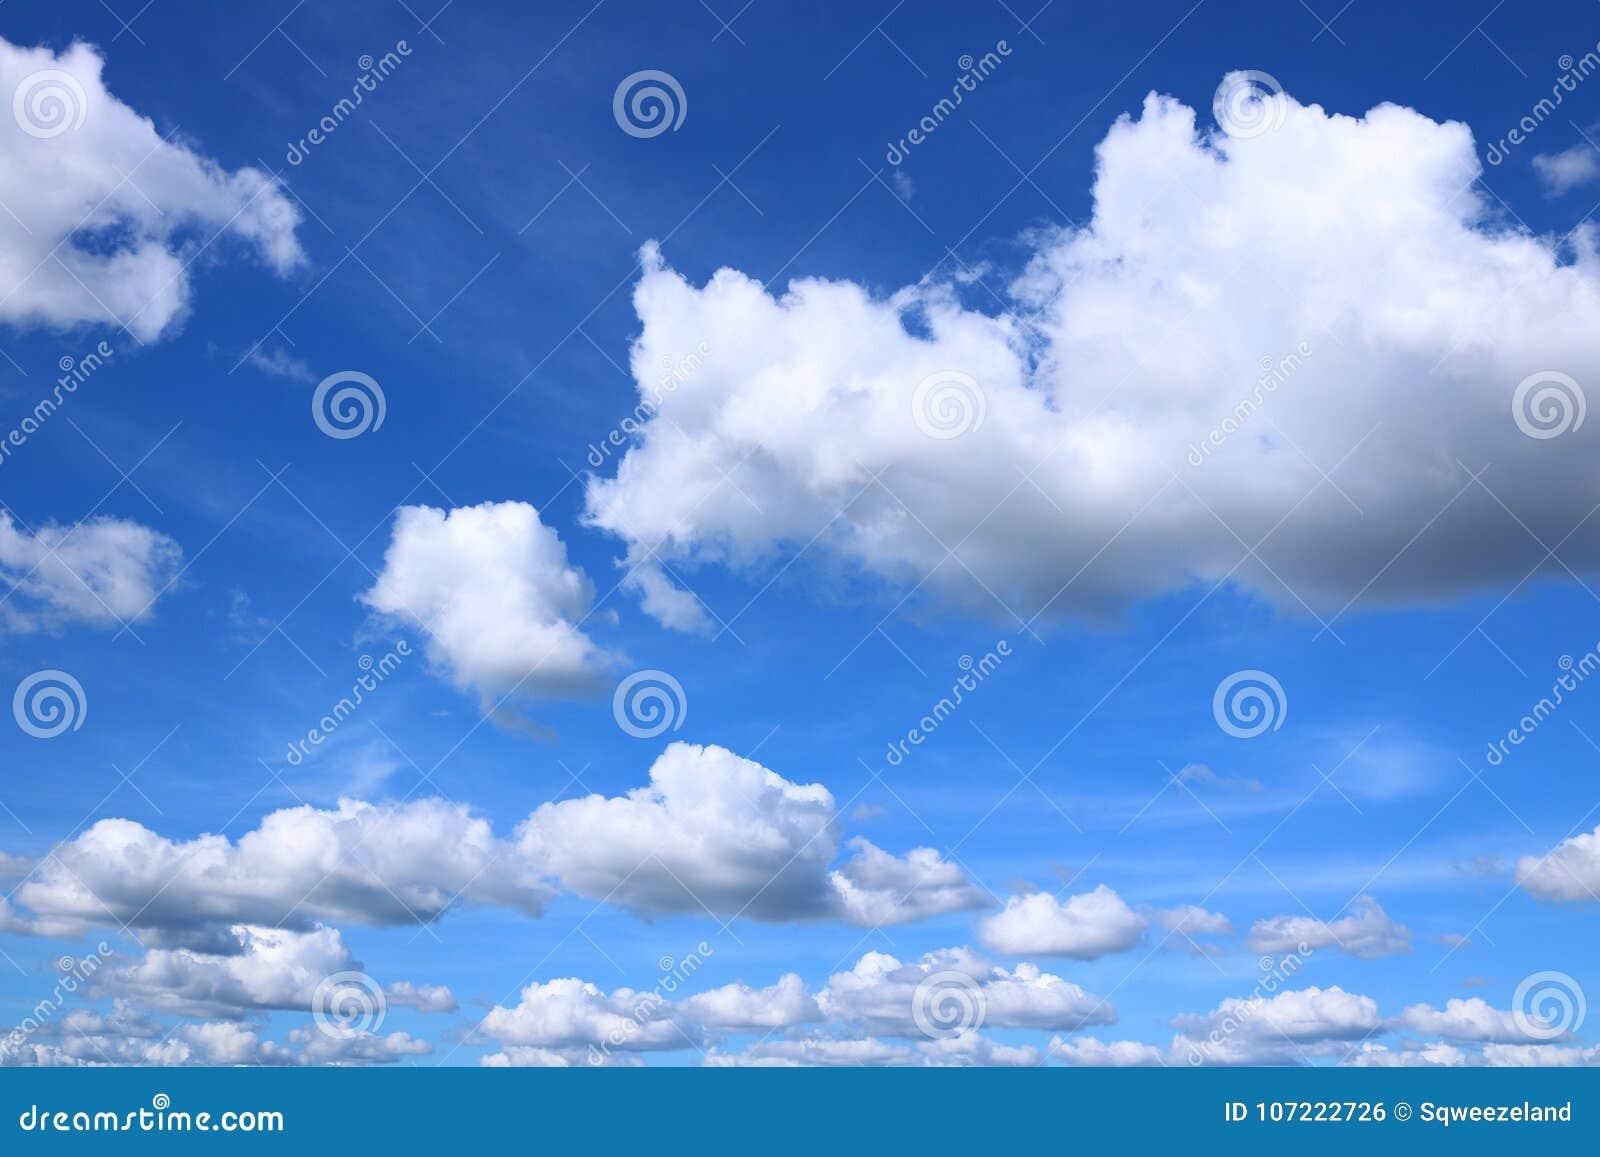 Błękit chmurnieje cumulusu niebo